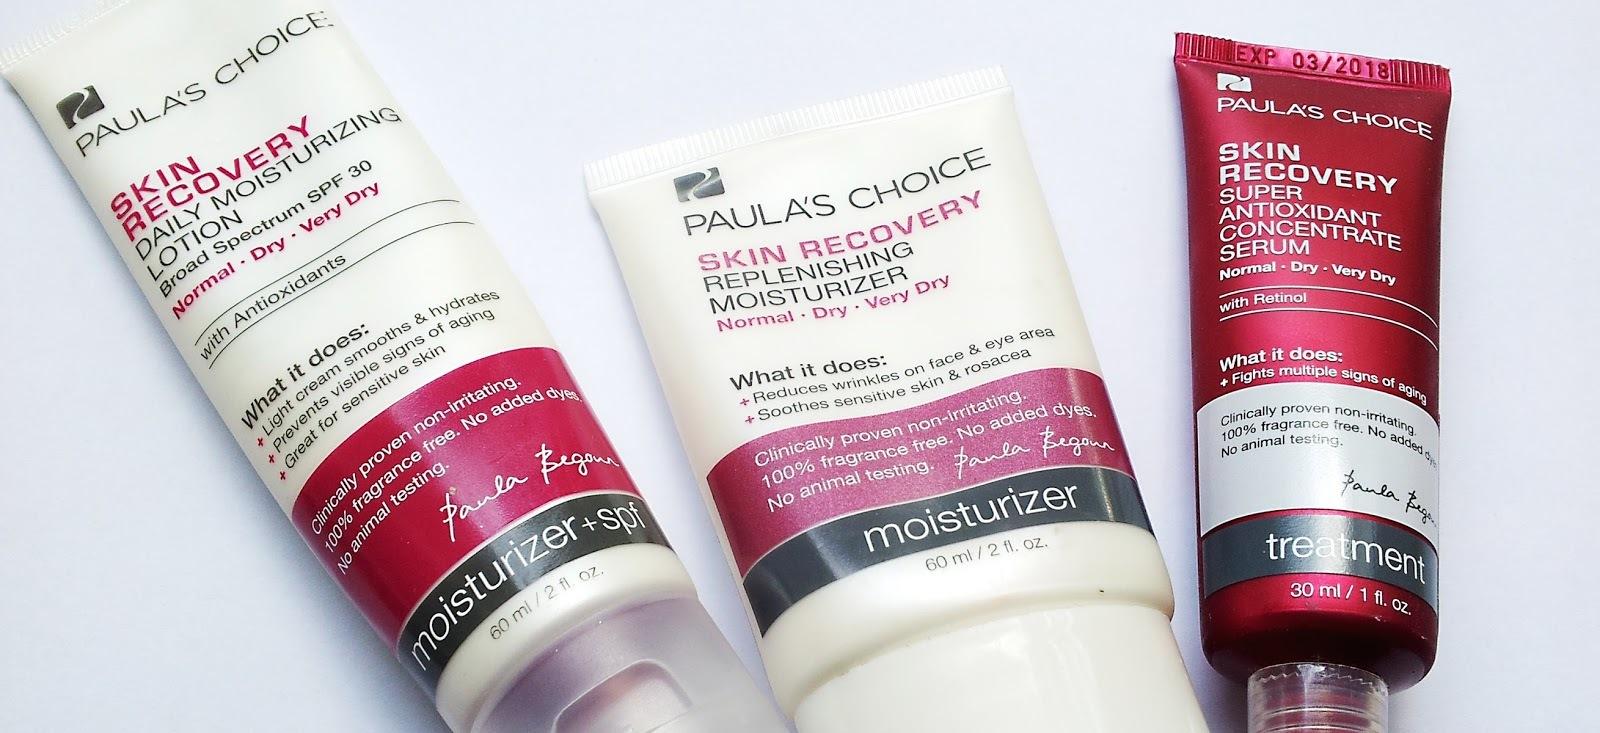 Paulas Choice Shopping Guide Empfehlungen von Beautybloggerin Sunnivah